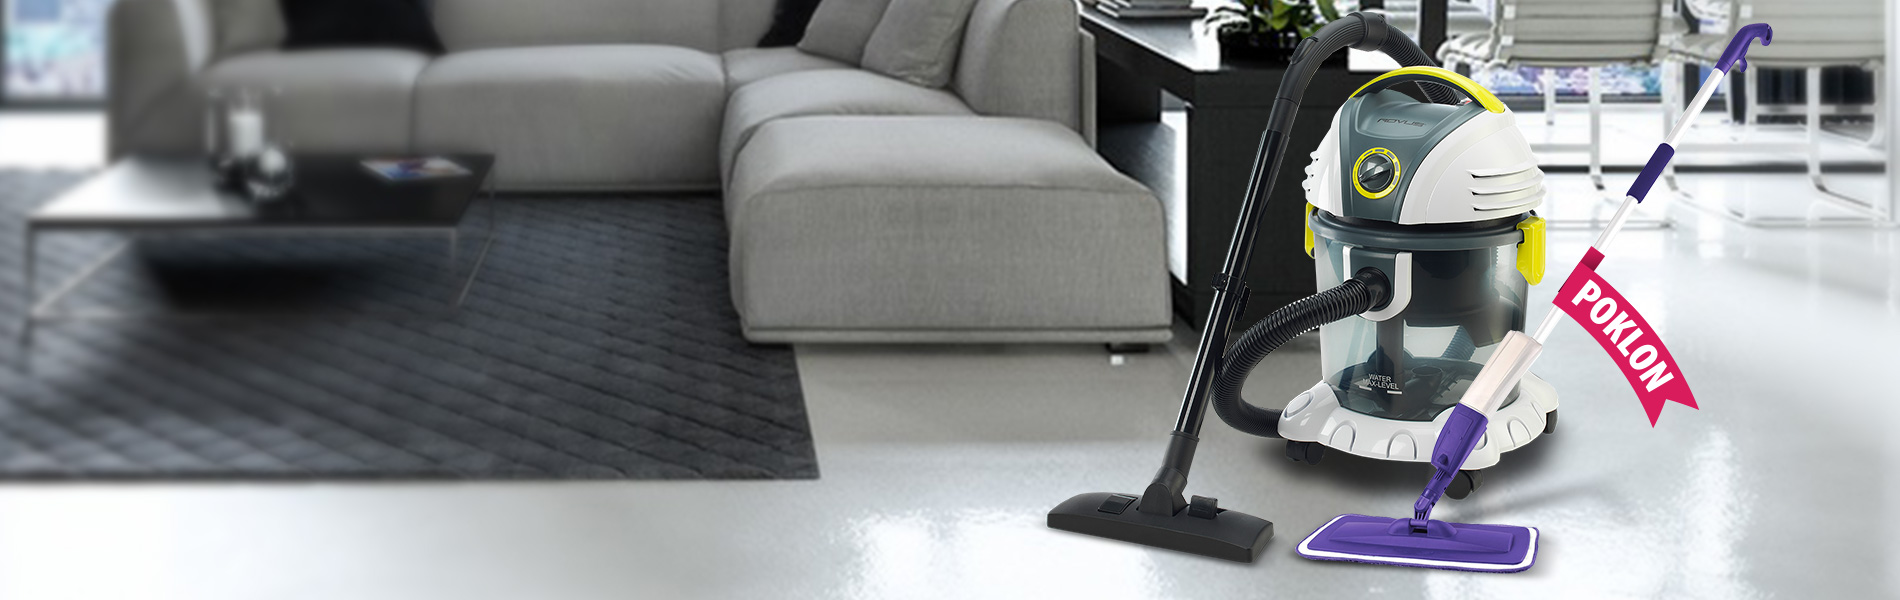 Victor usisivač + POKLON Spray Mop čistač podova